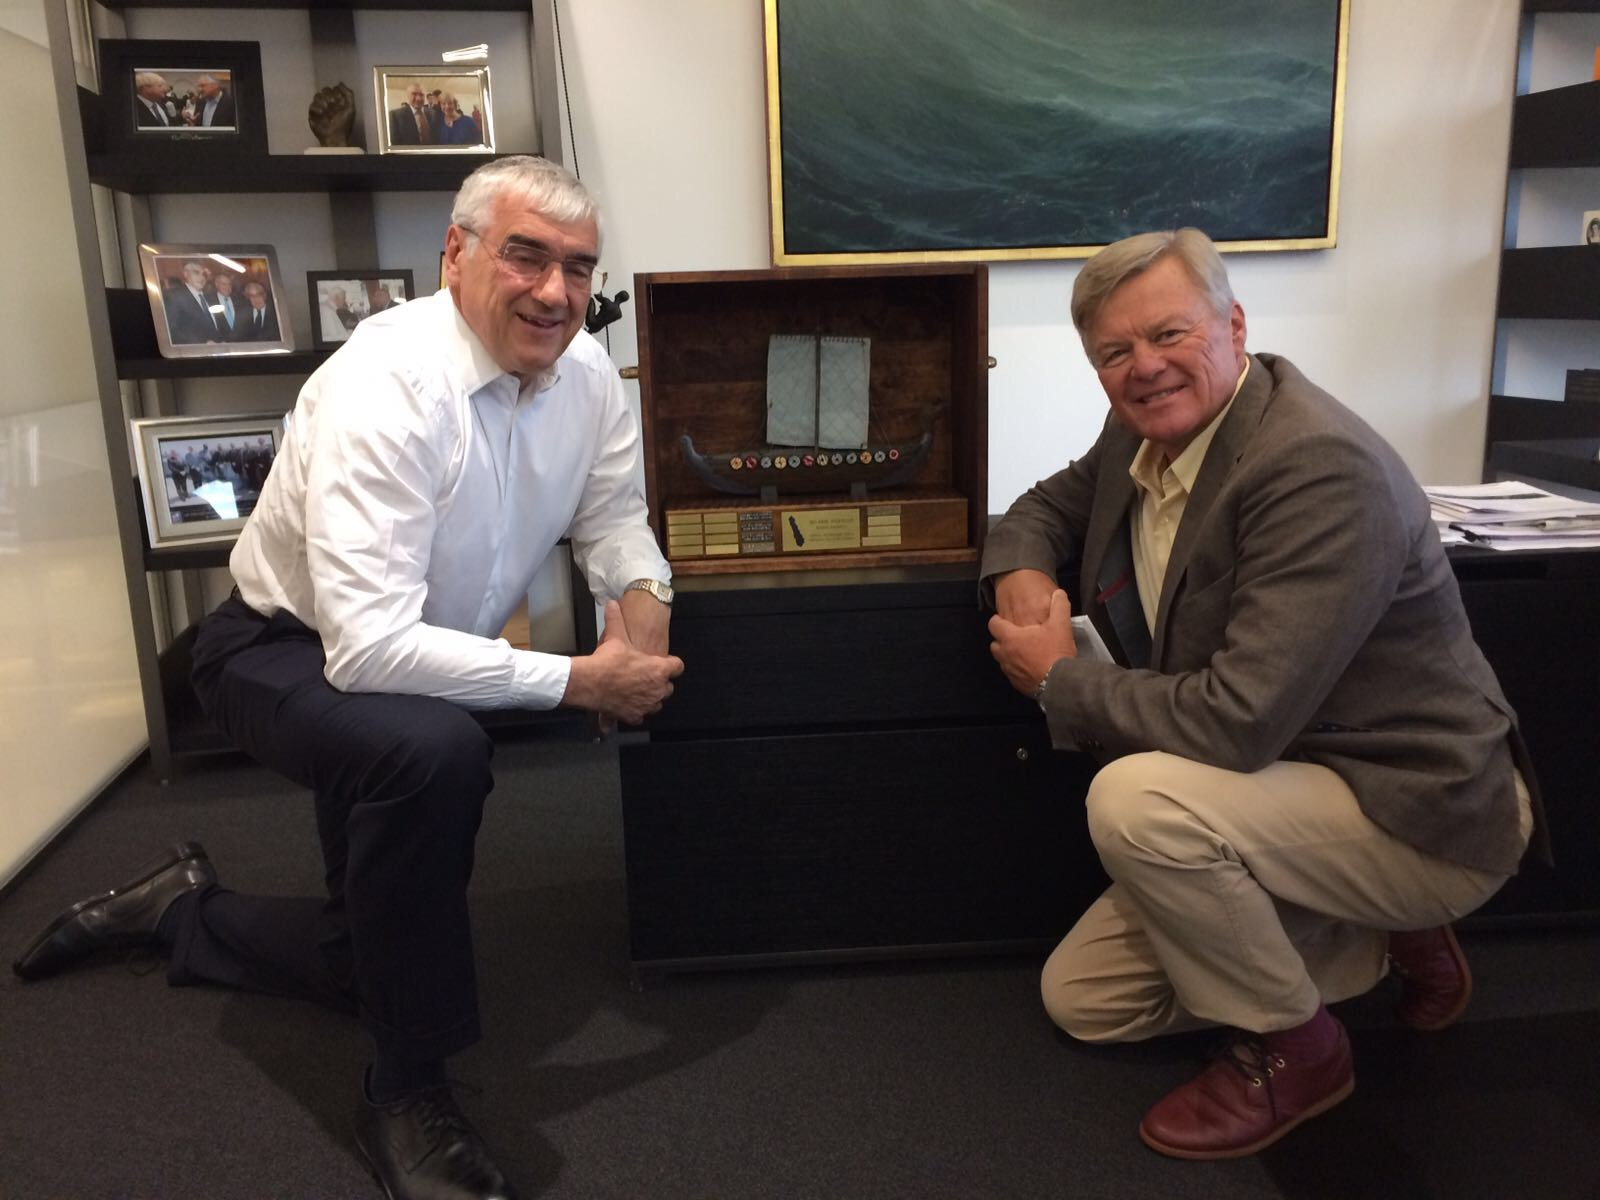 Sir Michael Hintze and Ludde Ingvall with the Alandia Suursaari Race Trophy